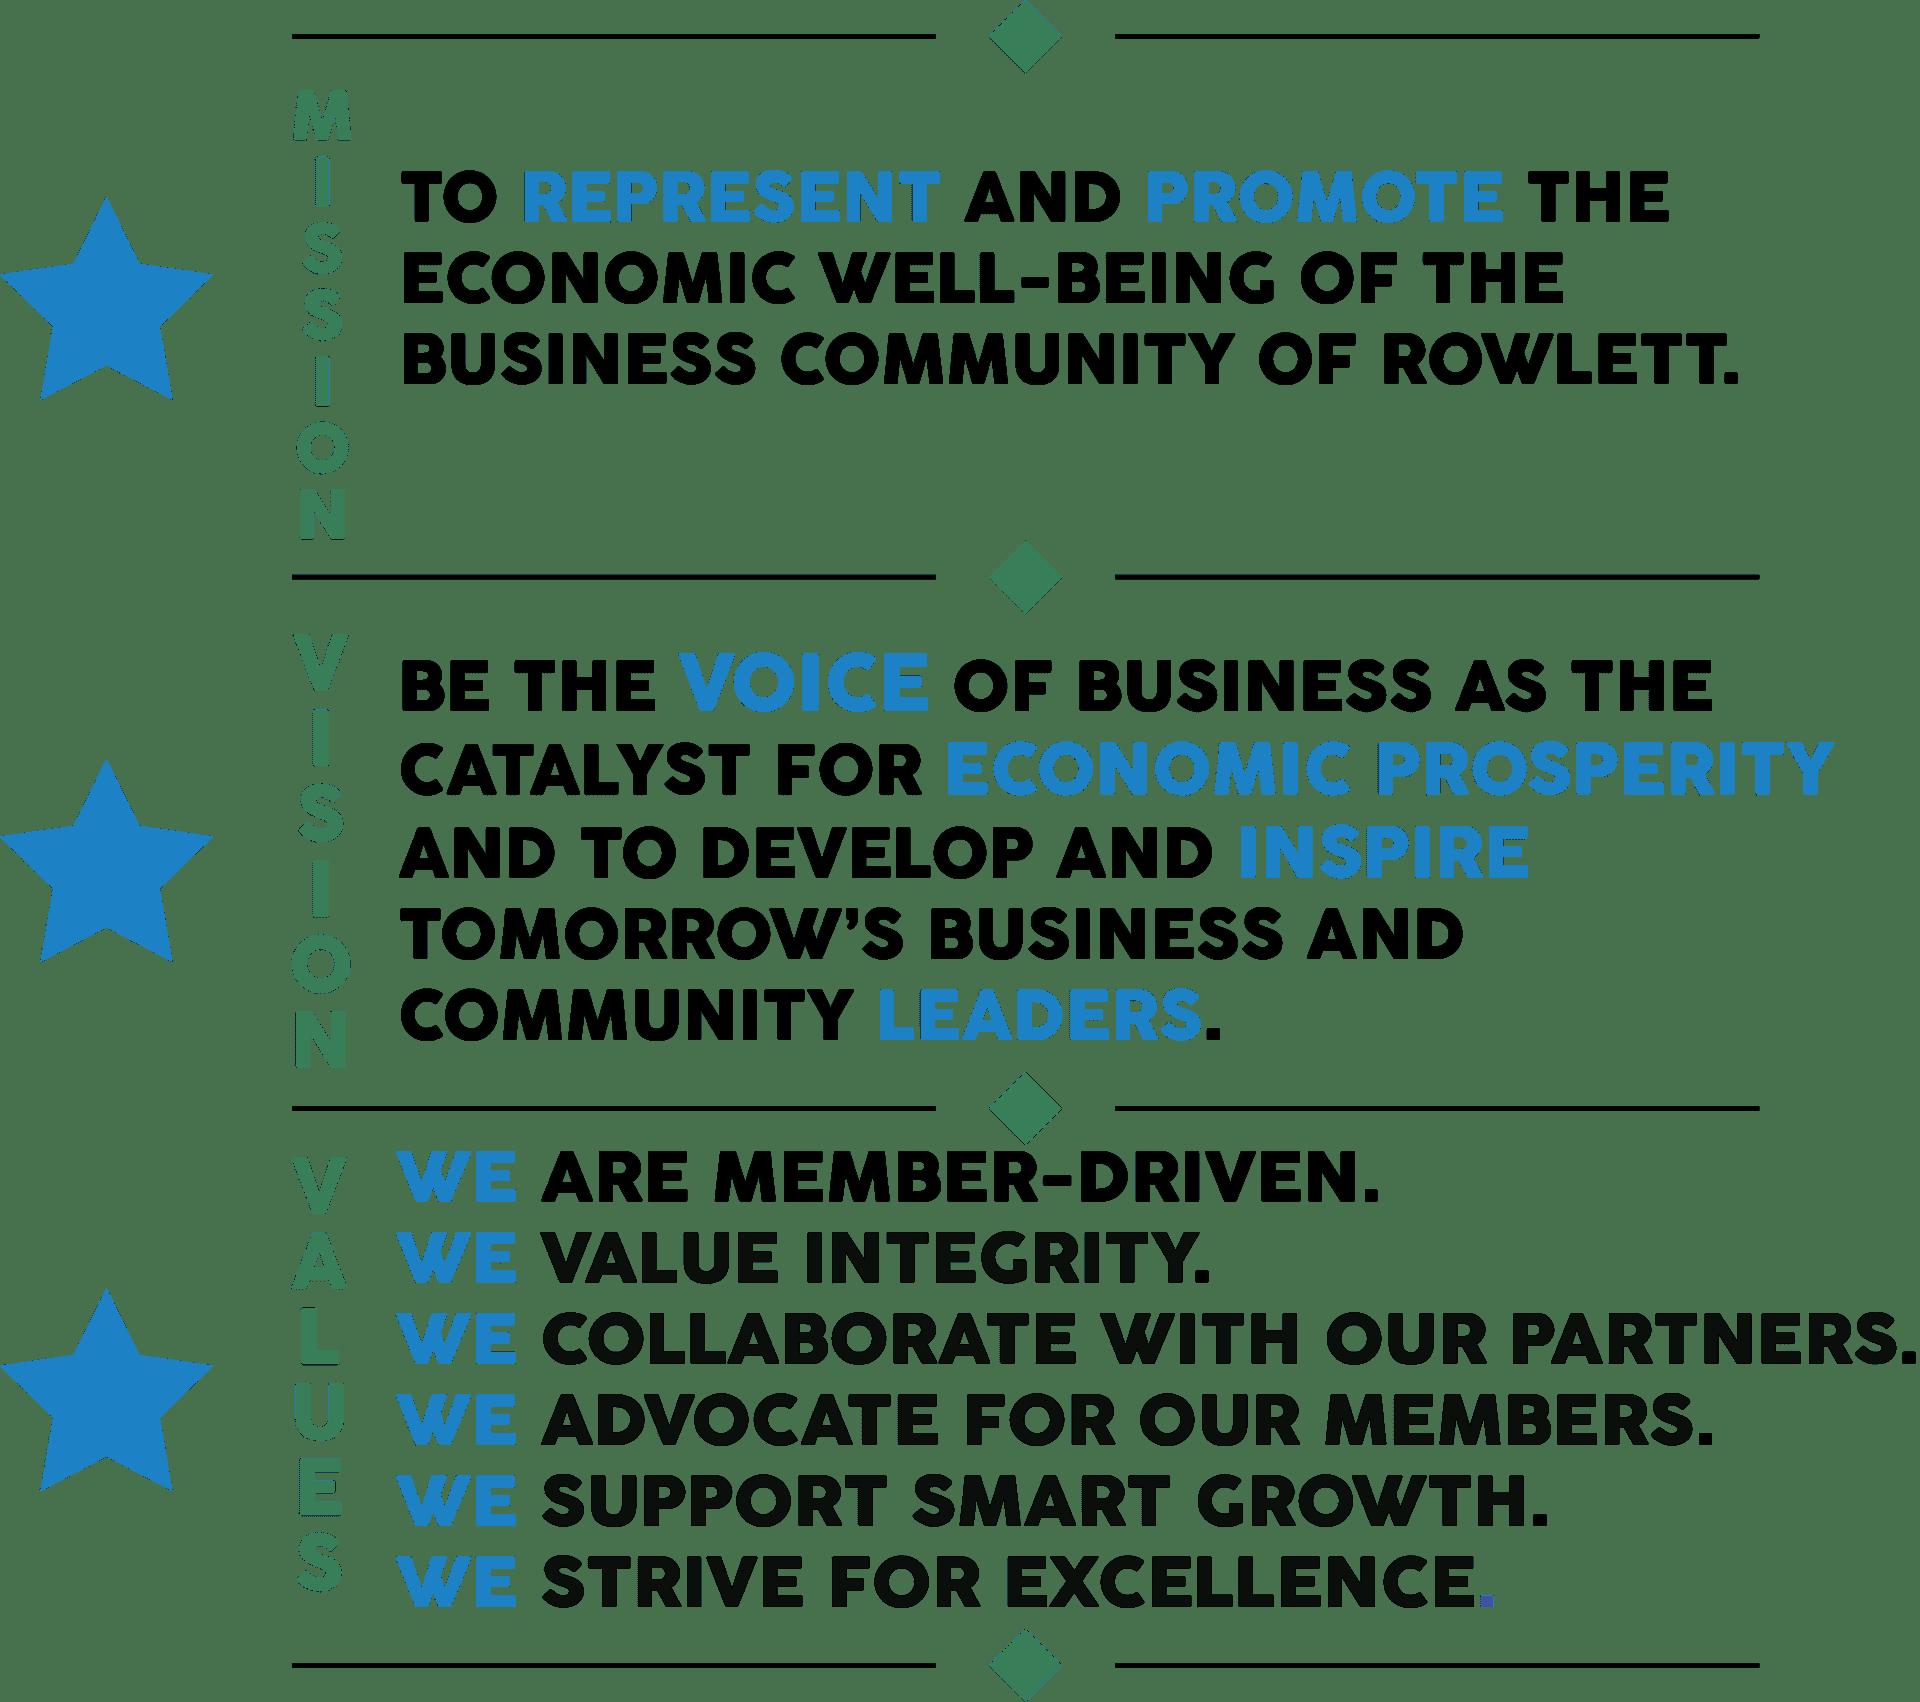 Mission Vision Values